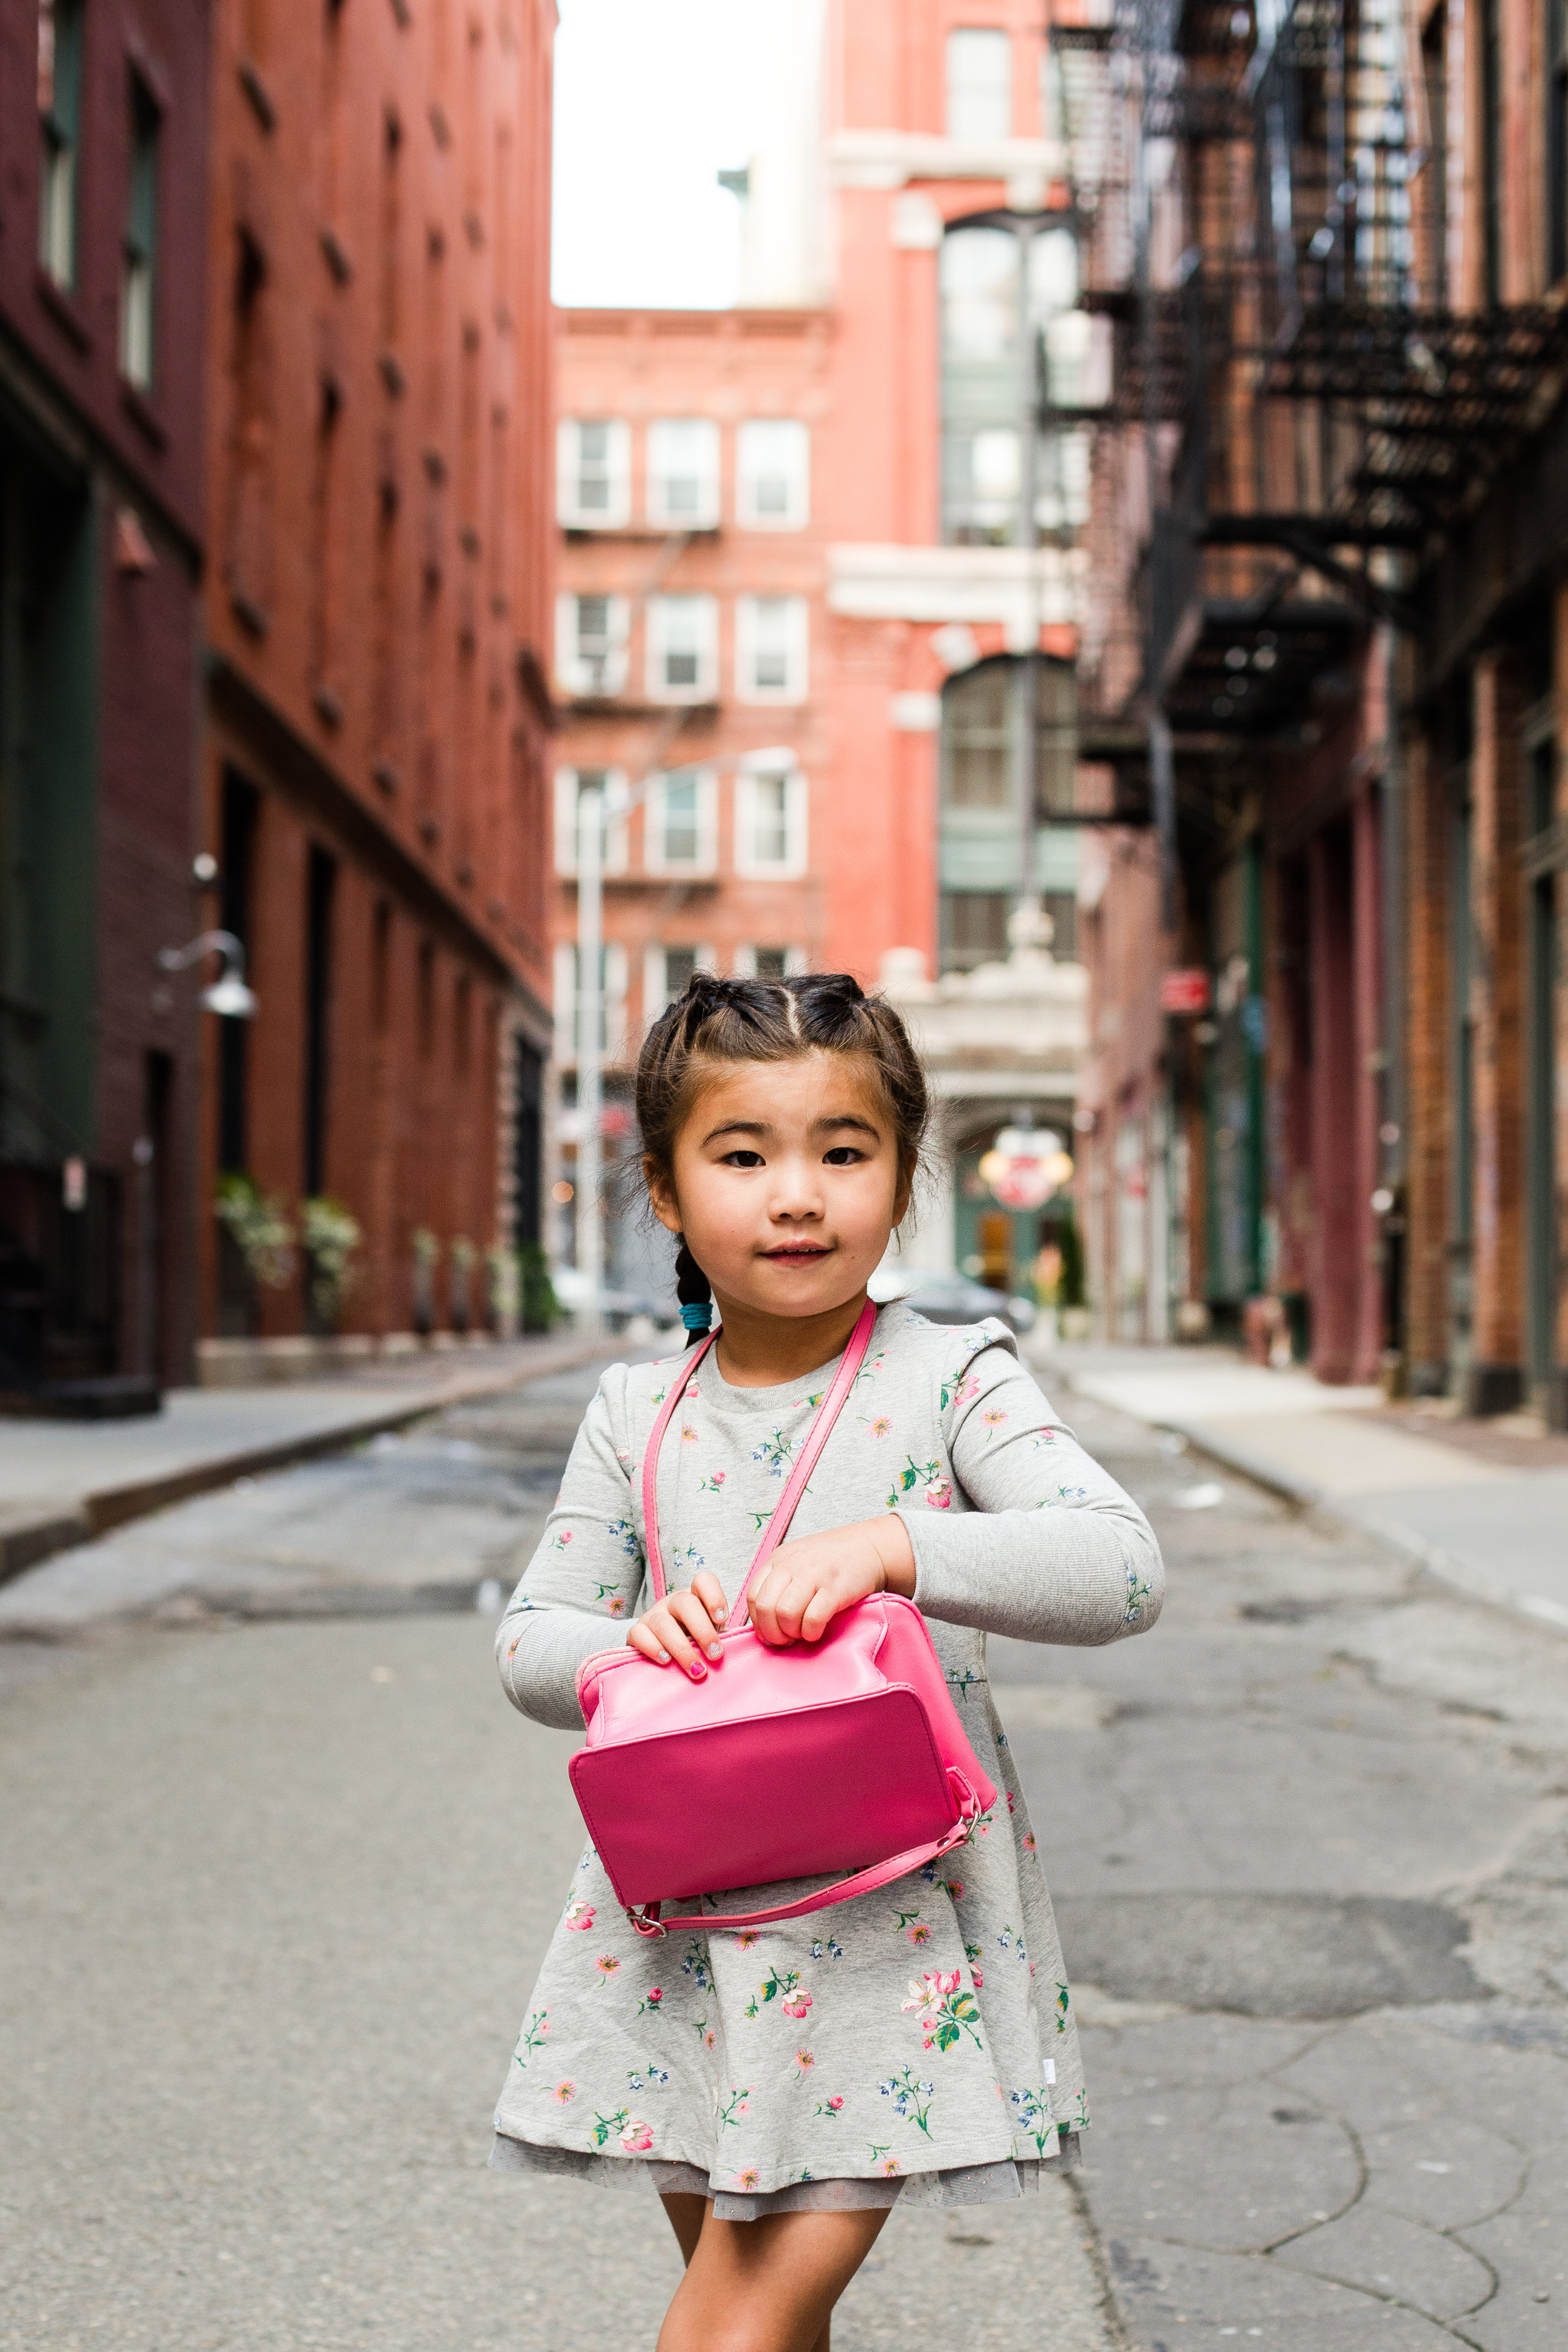 lissiephoto_loomis_nyc_family_photography45.JPG